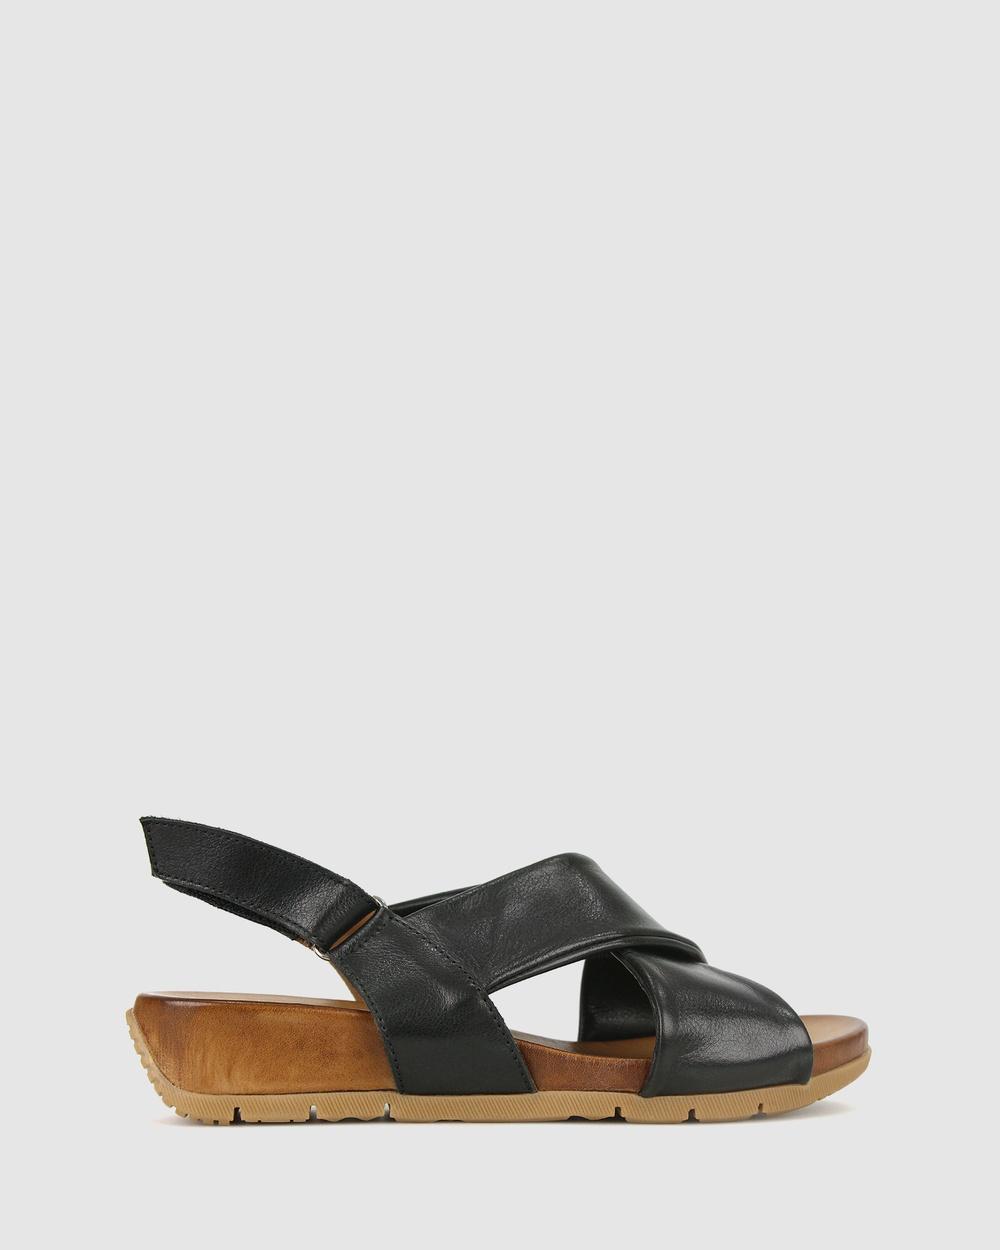 Airflex Zada Leather Wedge Sandals Black